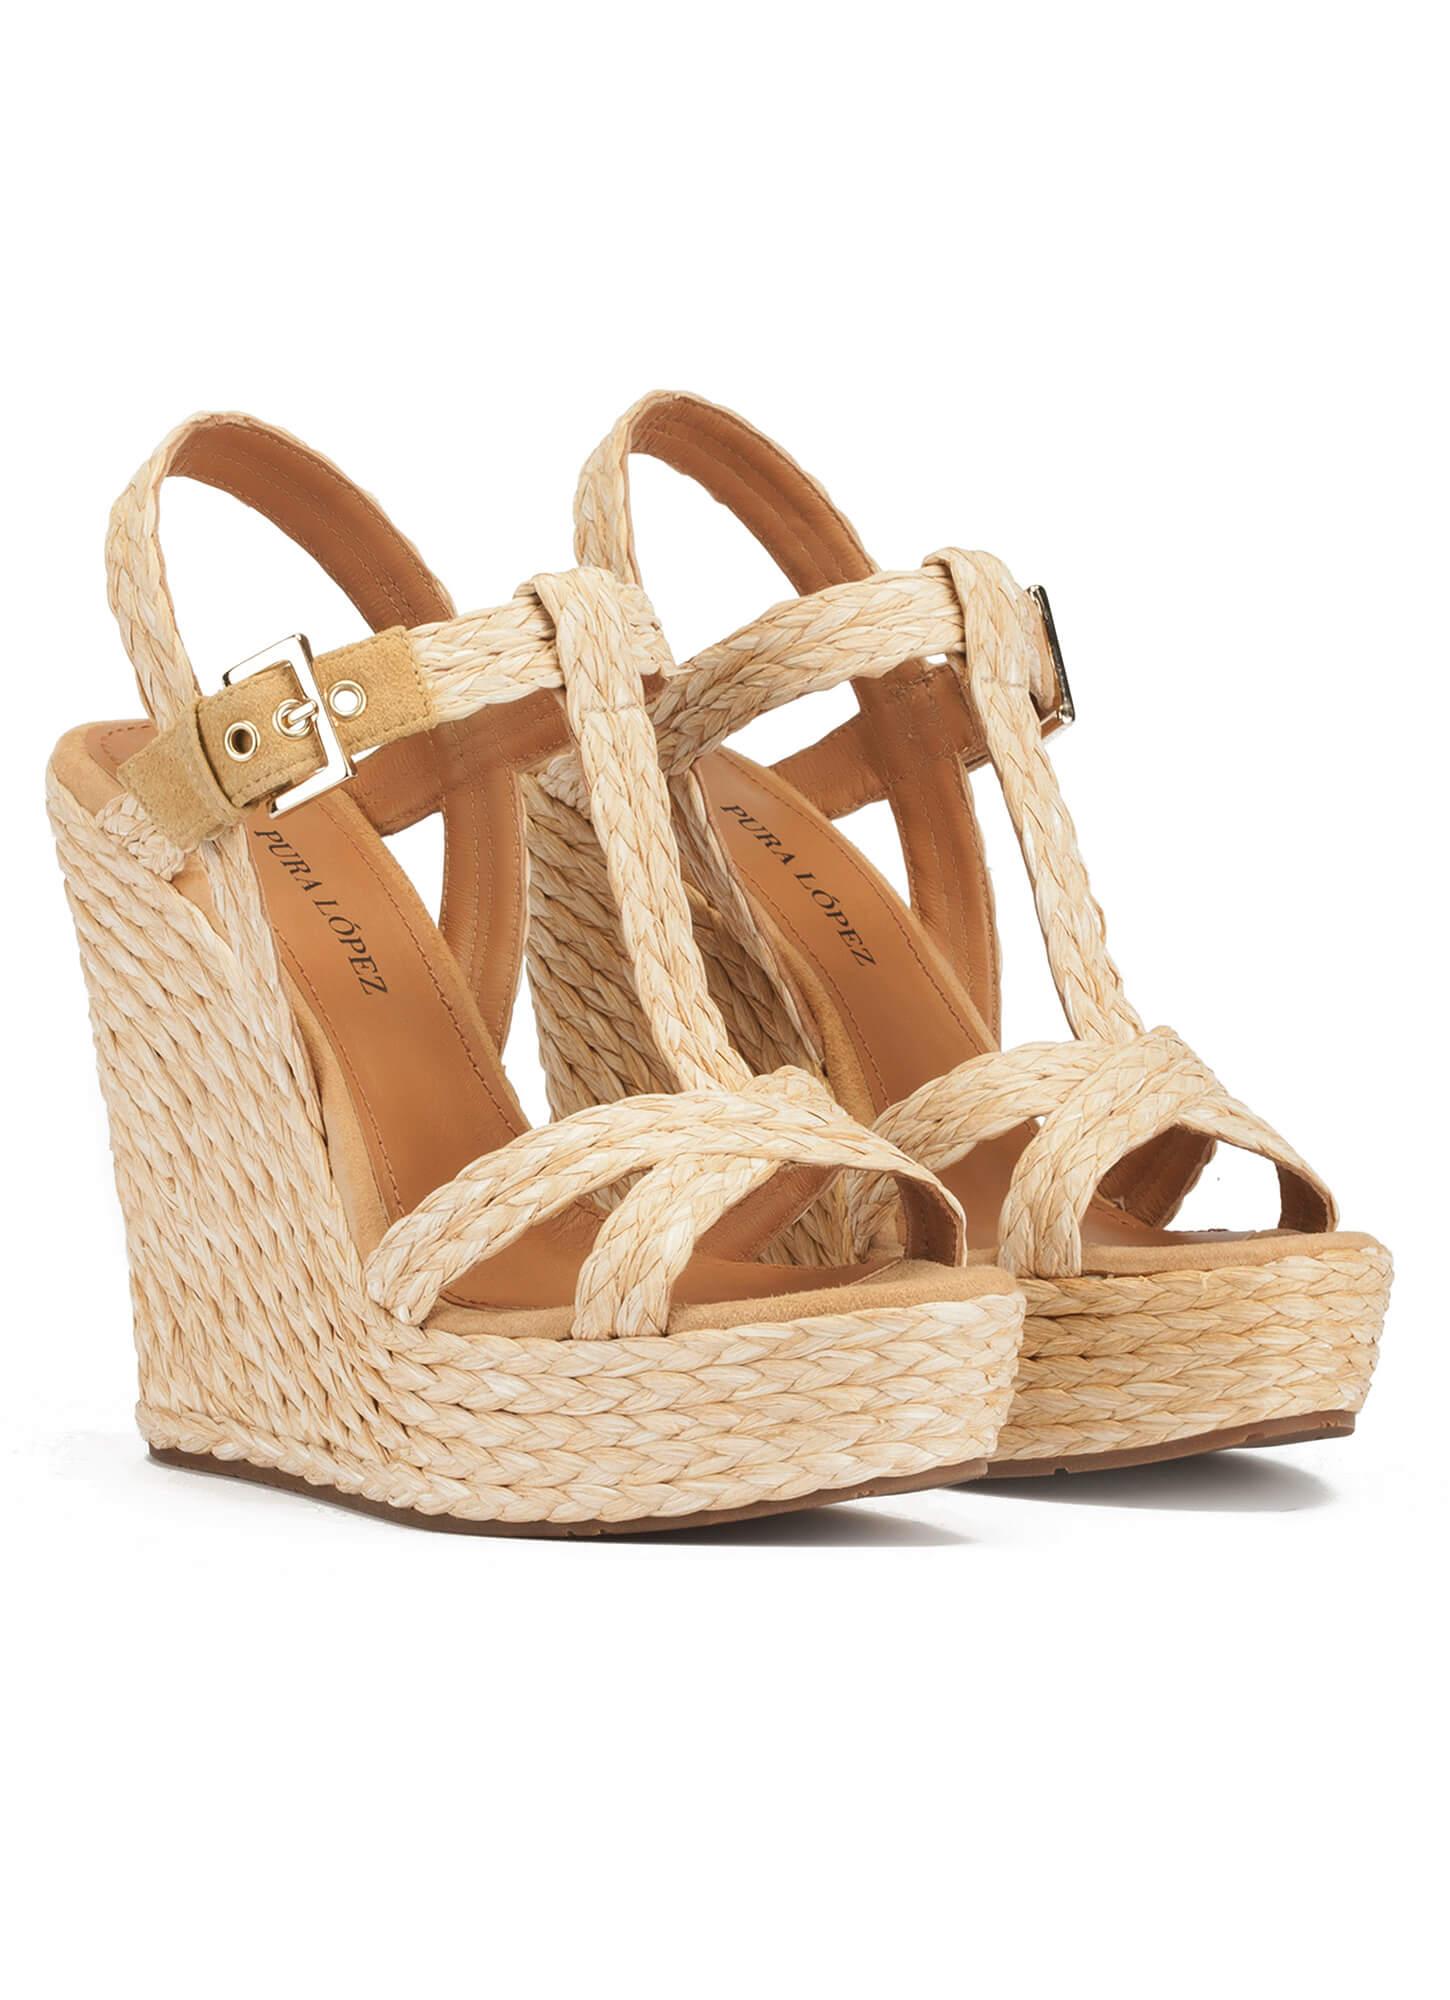 Rafia Sandalias Tienda De Zapatos En Cuña Pura López Natural nvmywON08